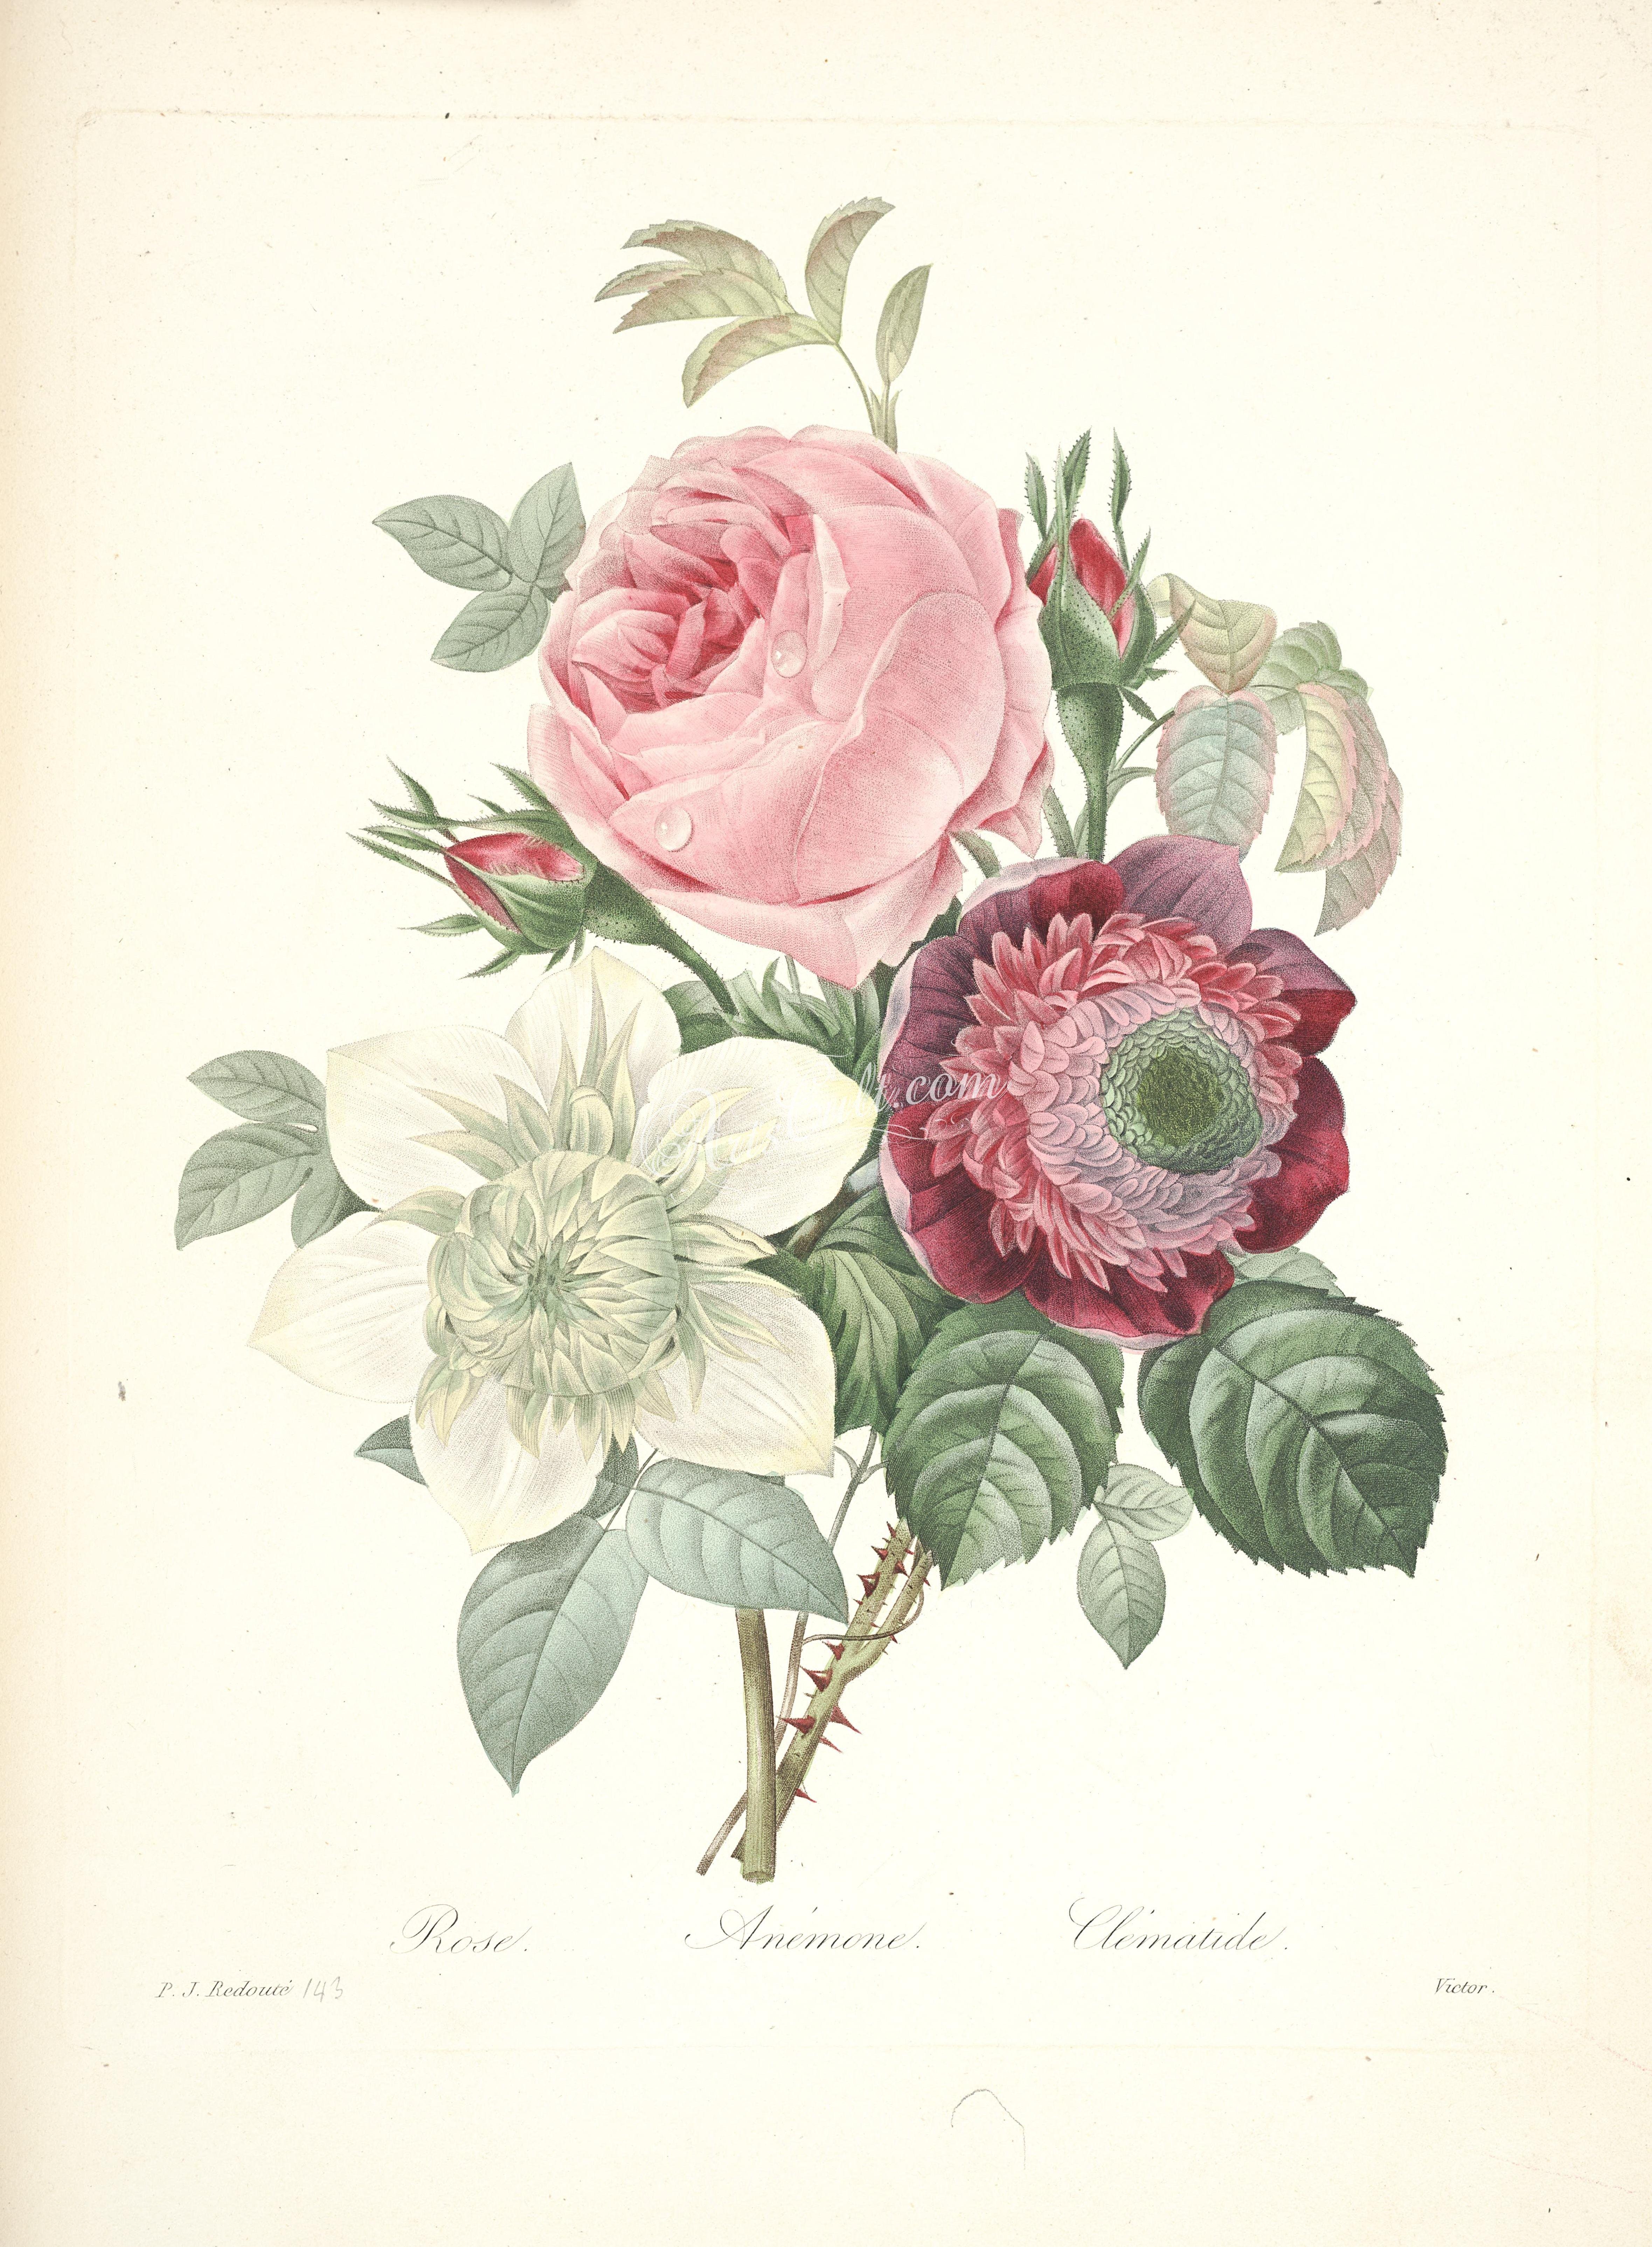 Rosa, Anemone, Clematis